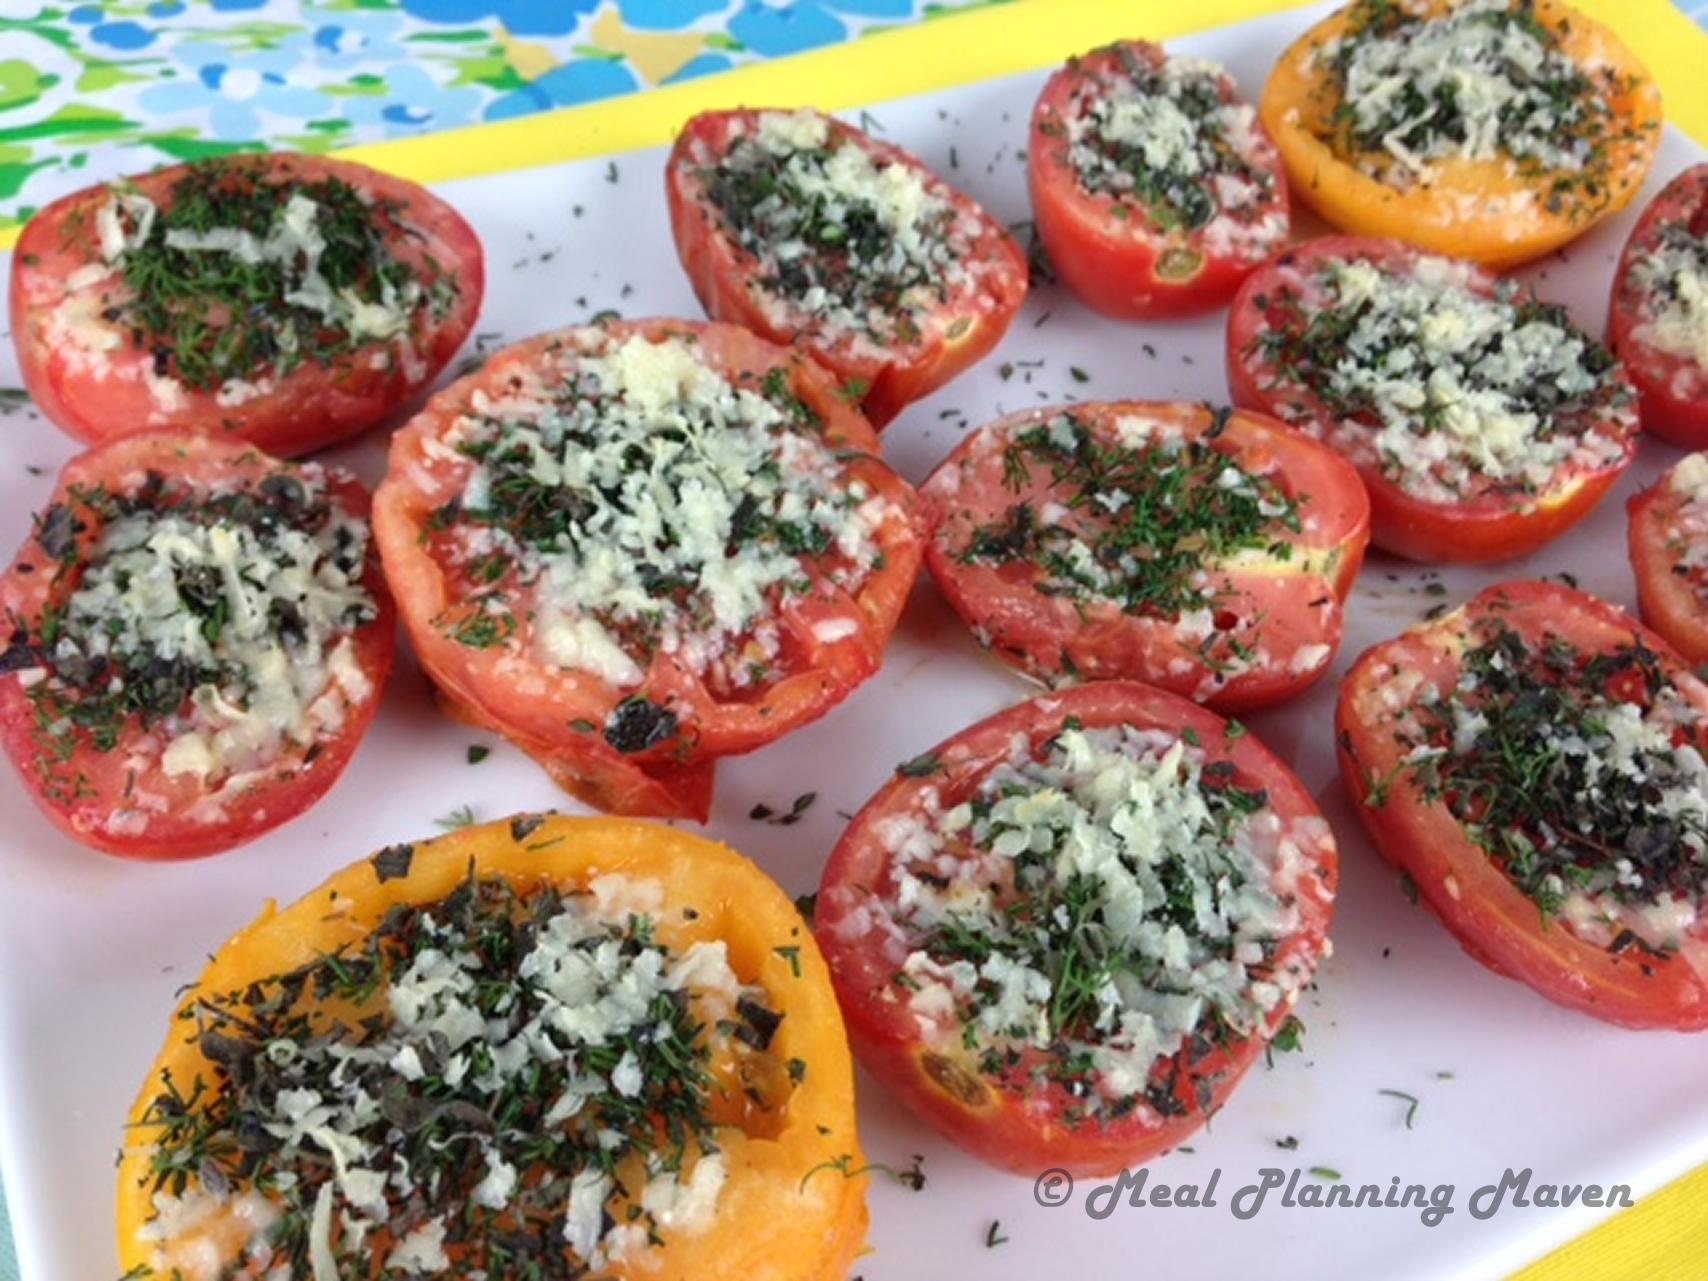 Grilled Parmesan 'n Herb-Crusted Tomatoes